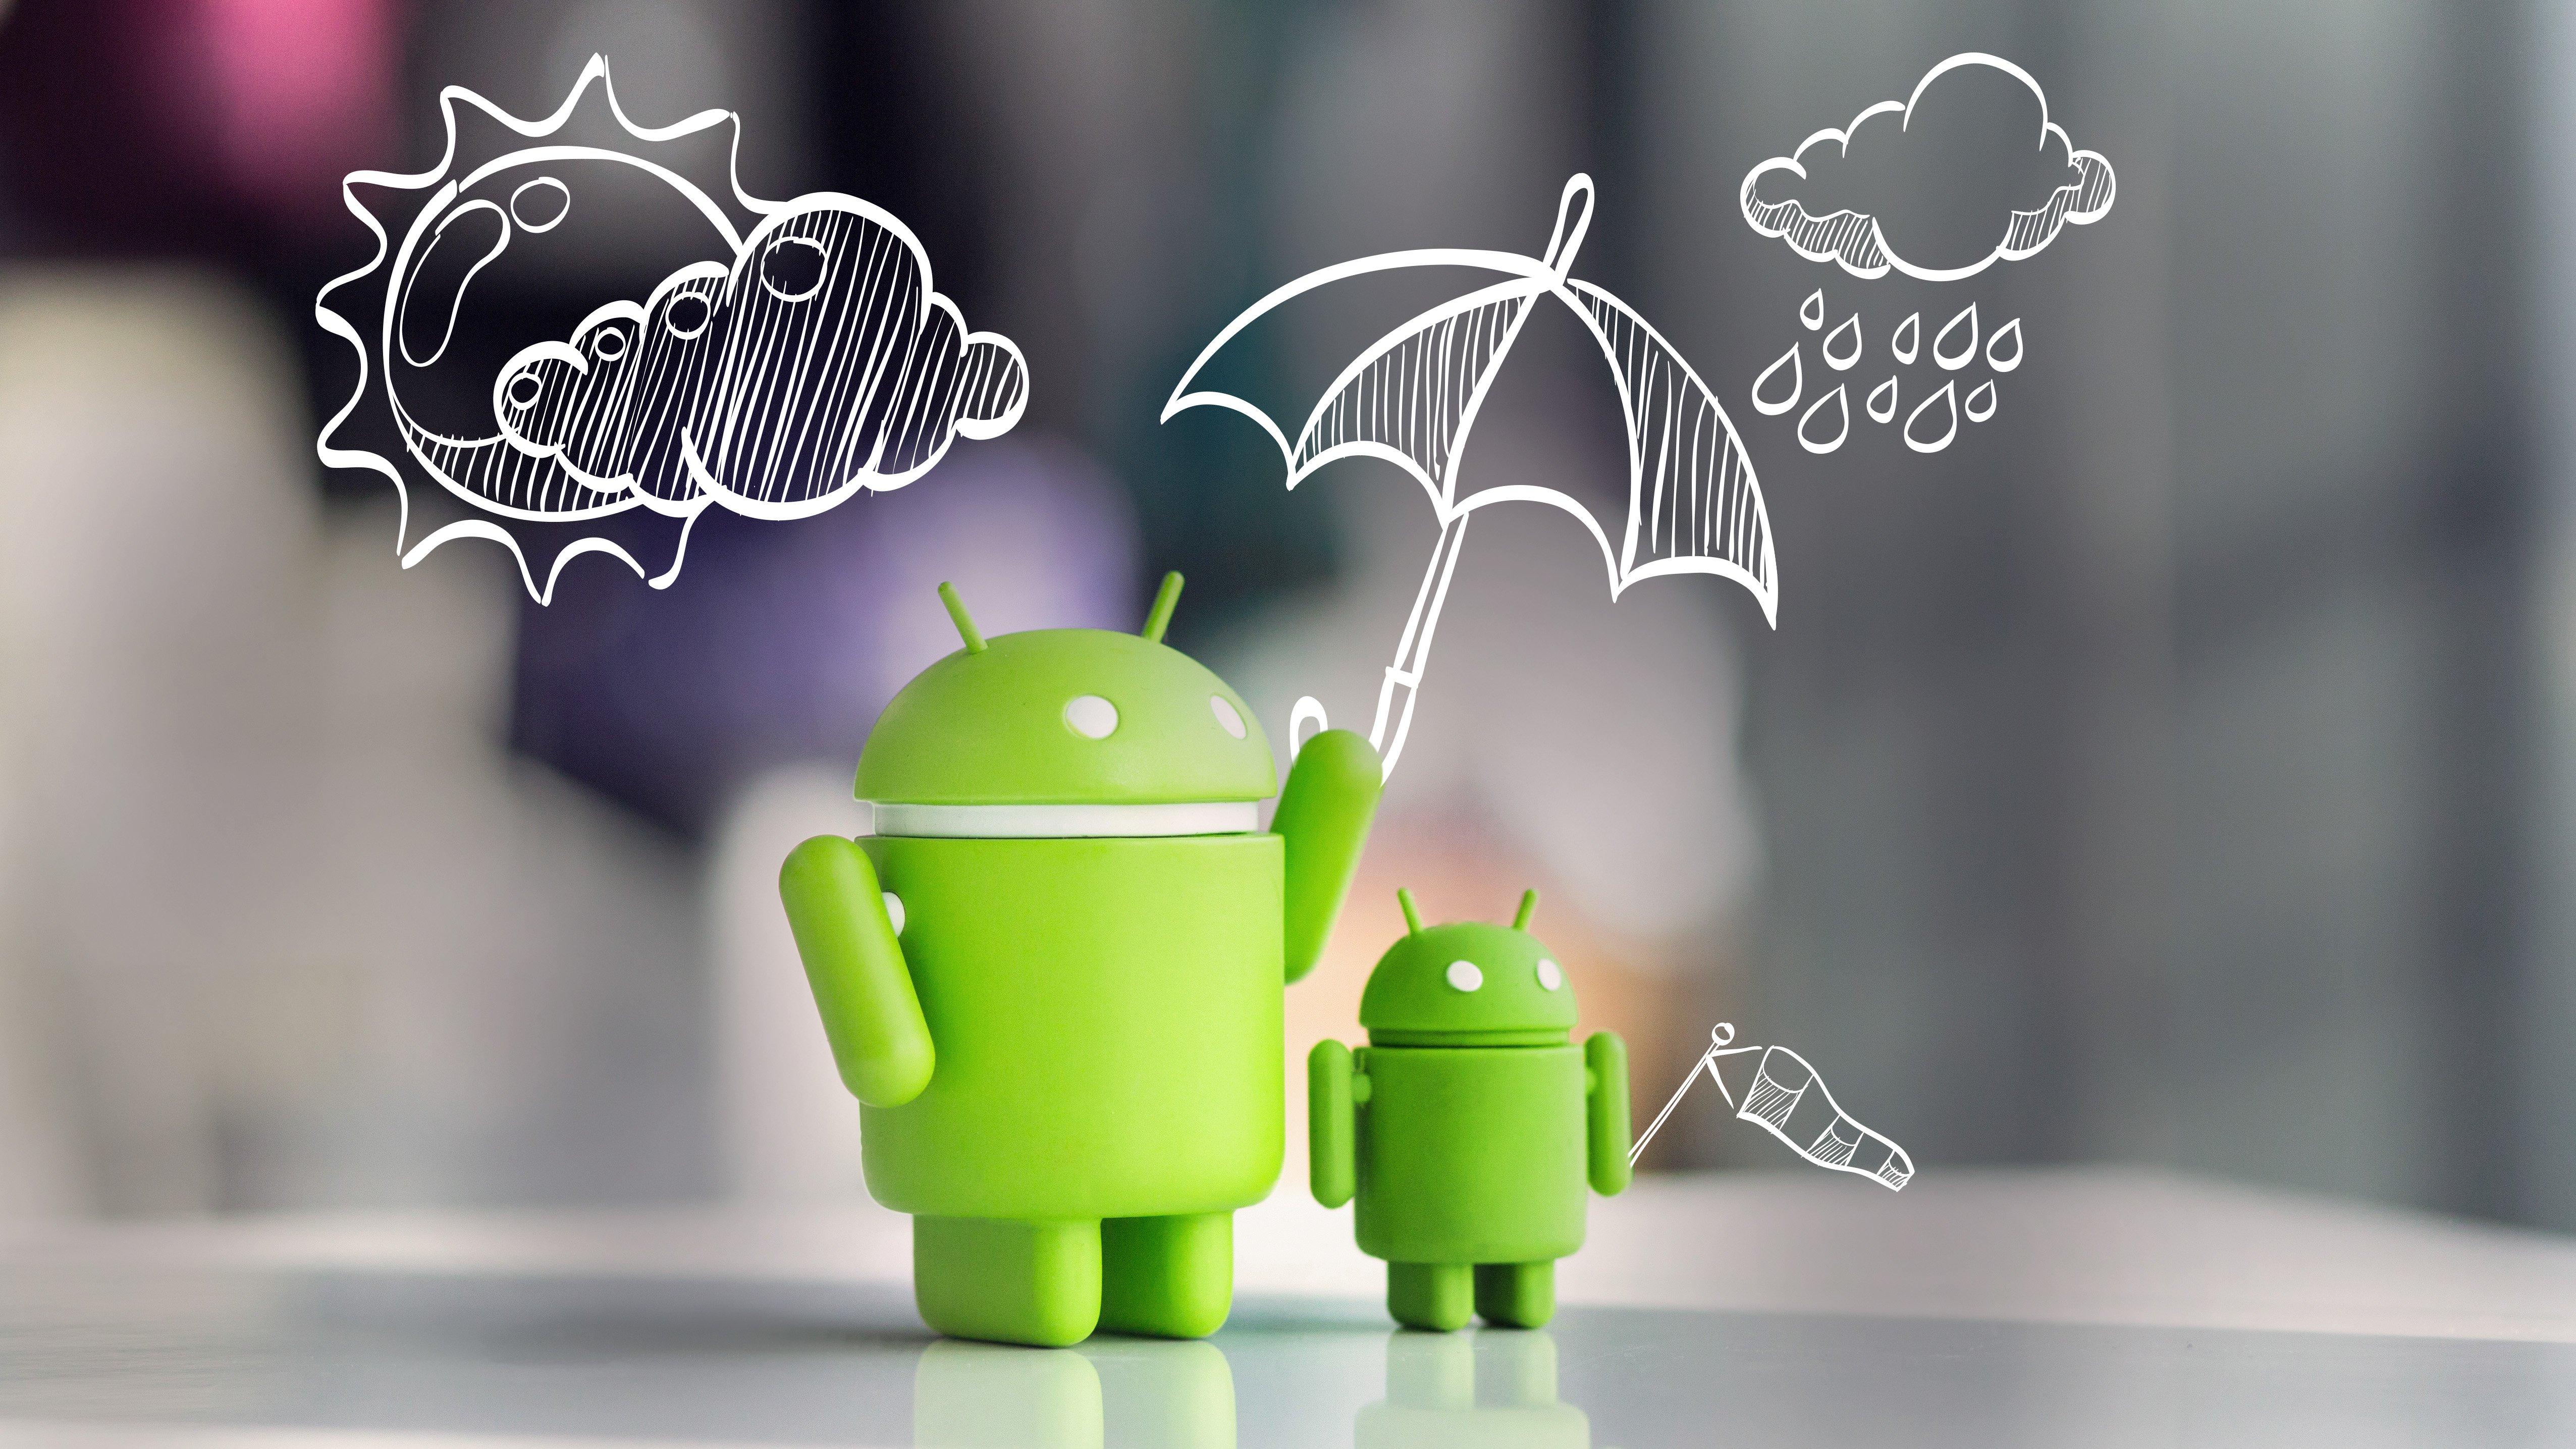 les meilleures applications m u00e9t u00e9o pour android